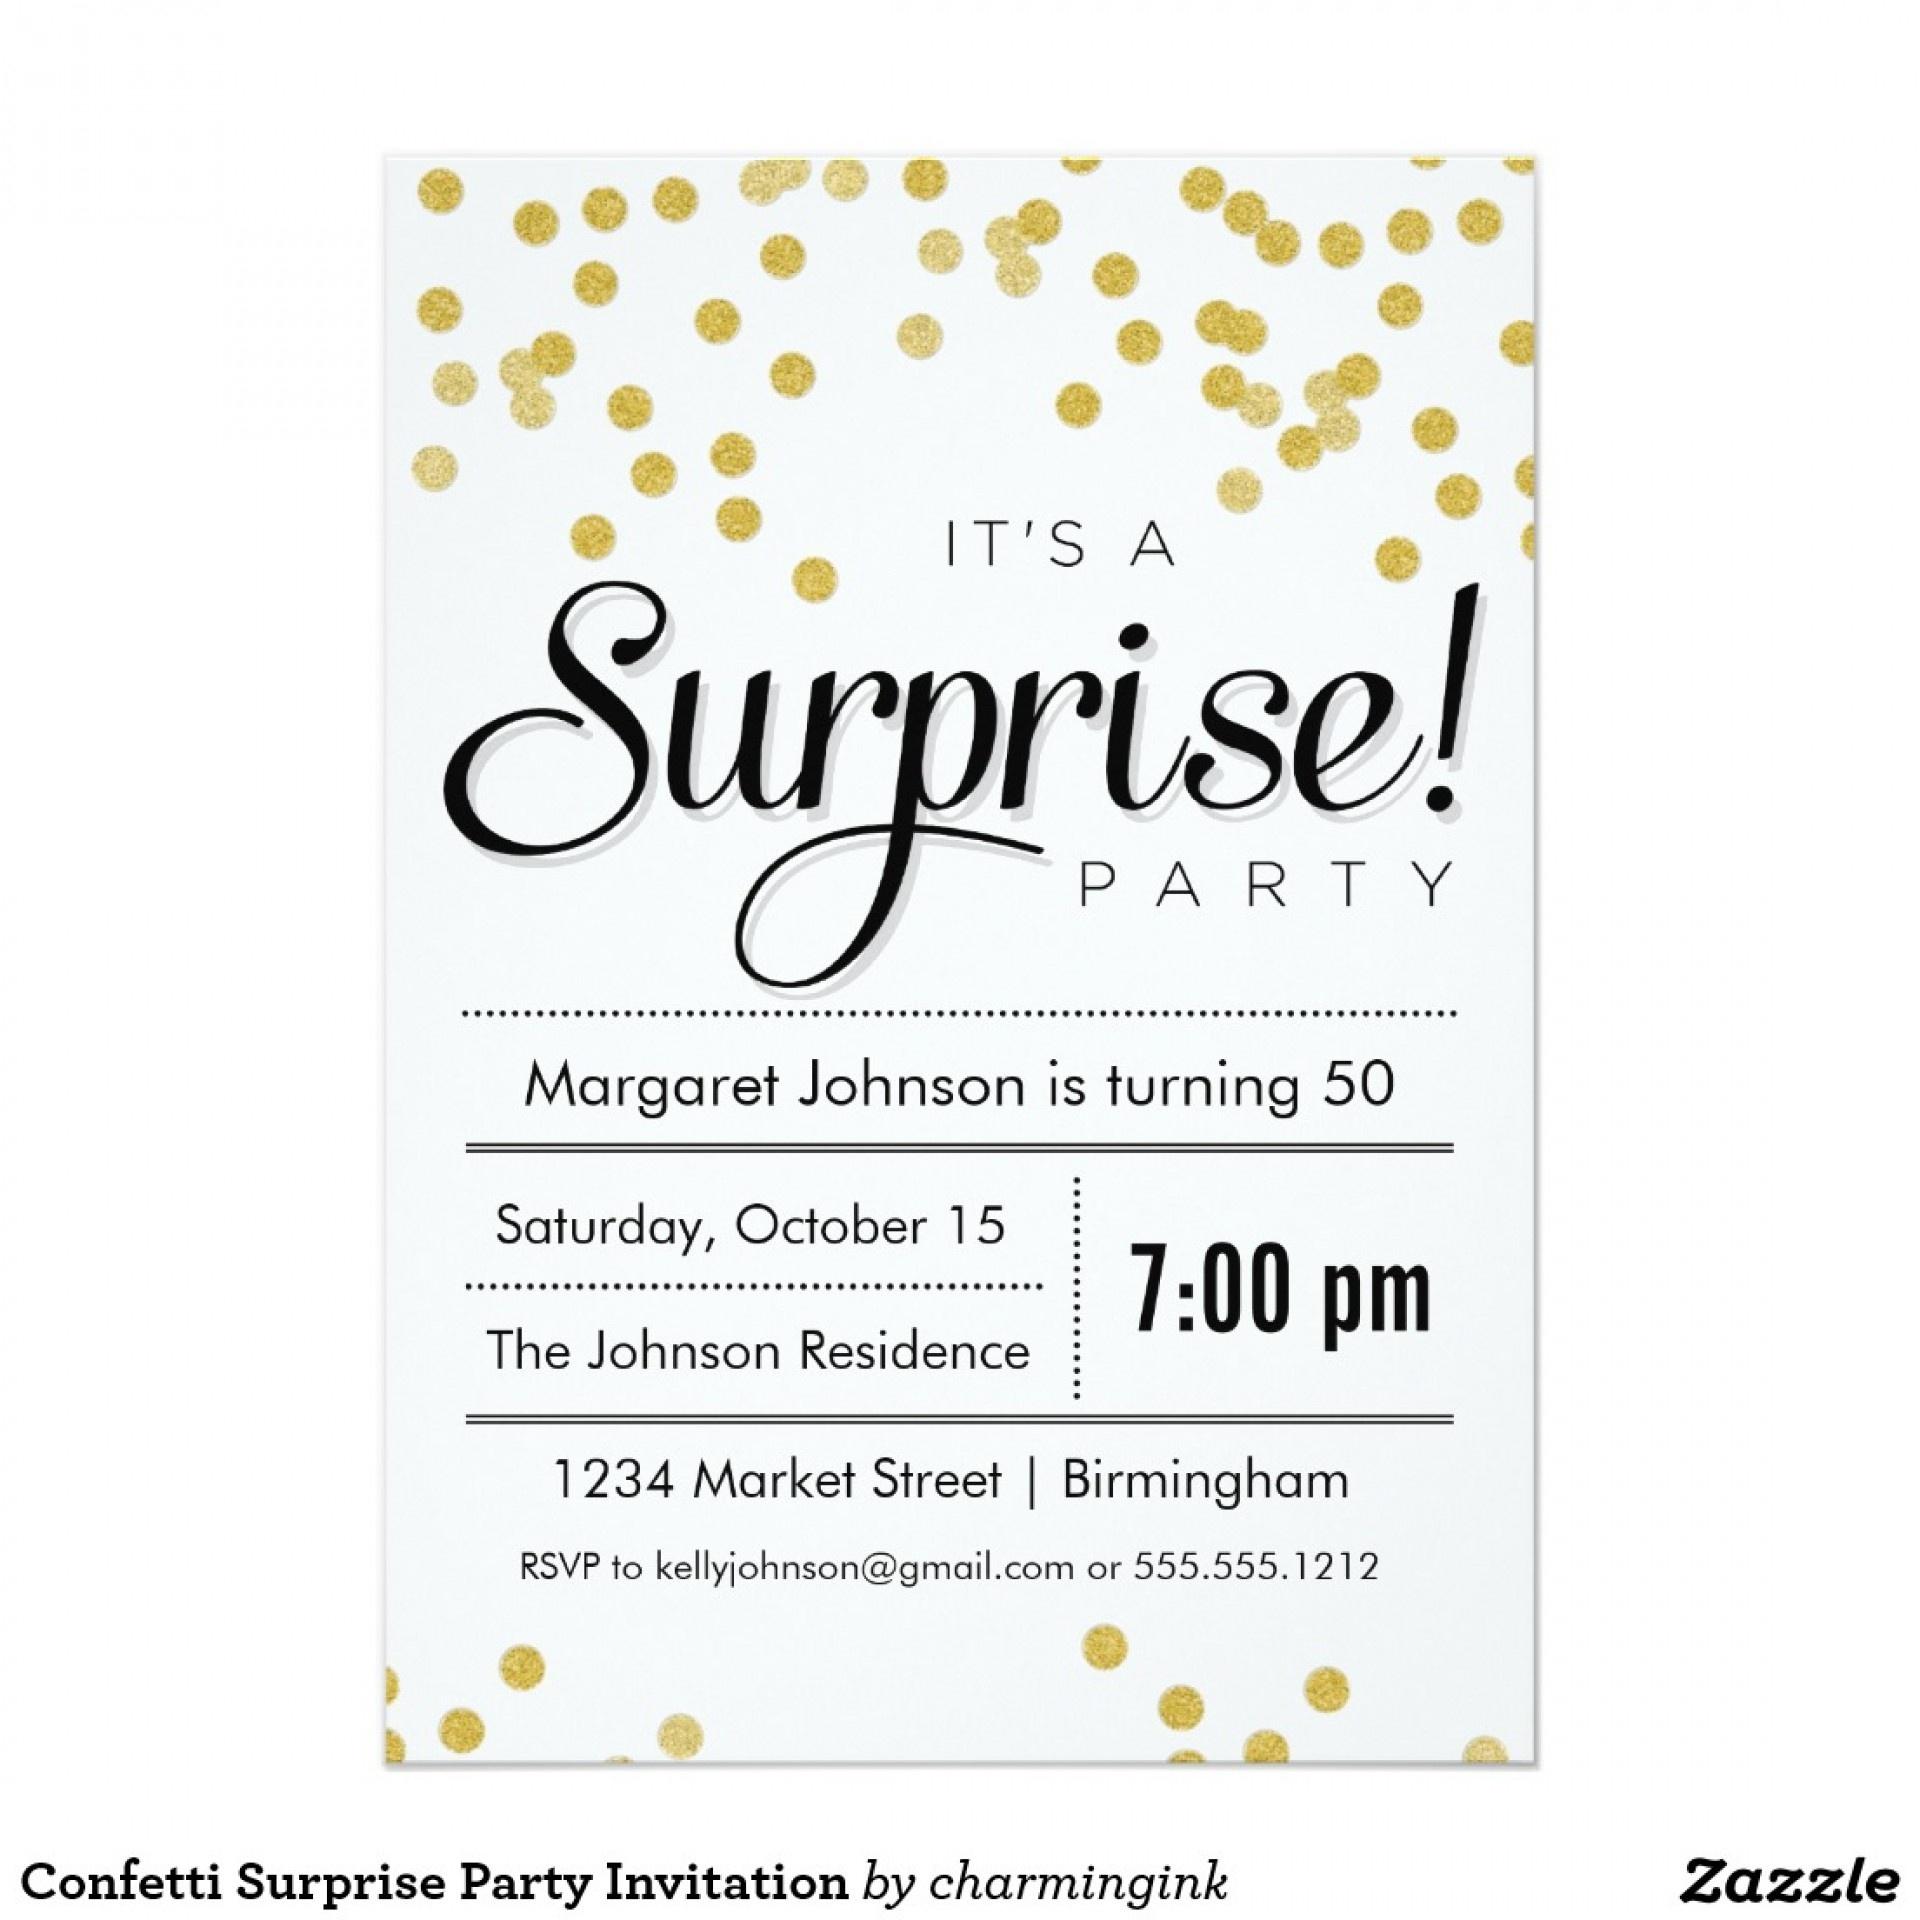 002 Surprise Party Invitation Templates Template Singular Ideas 60Th - Free Printable Surprise Party Invitation Templates